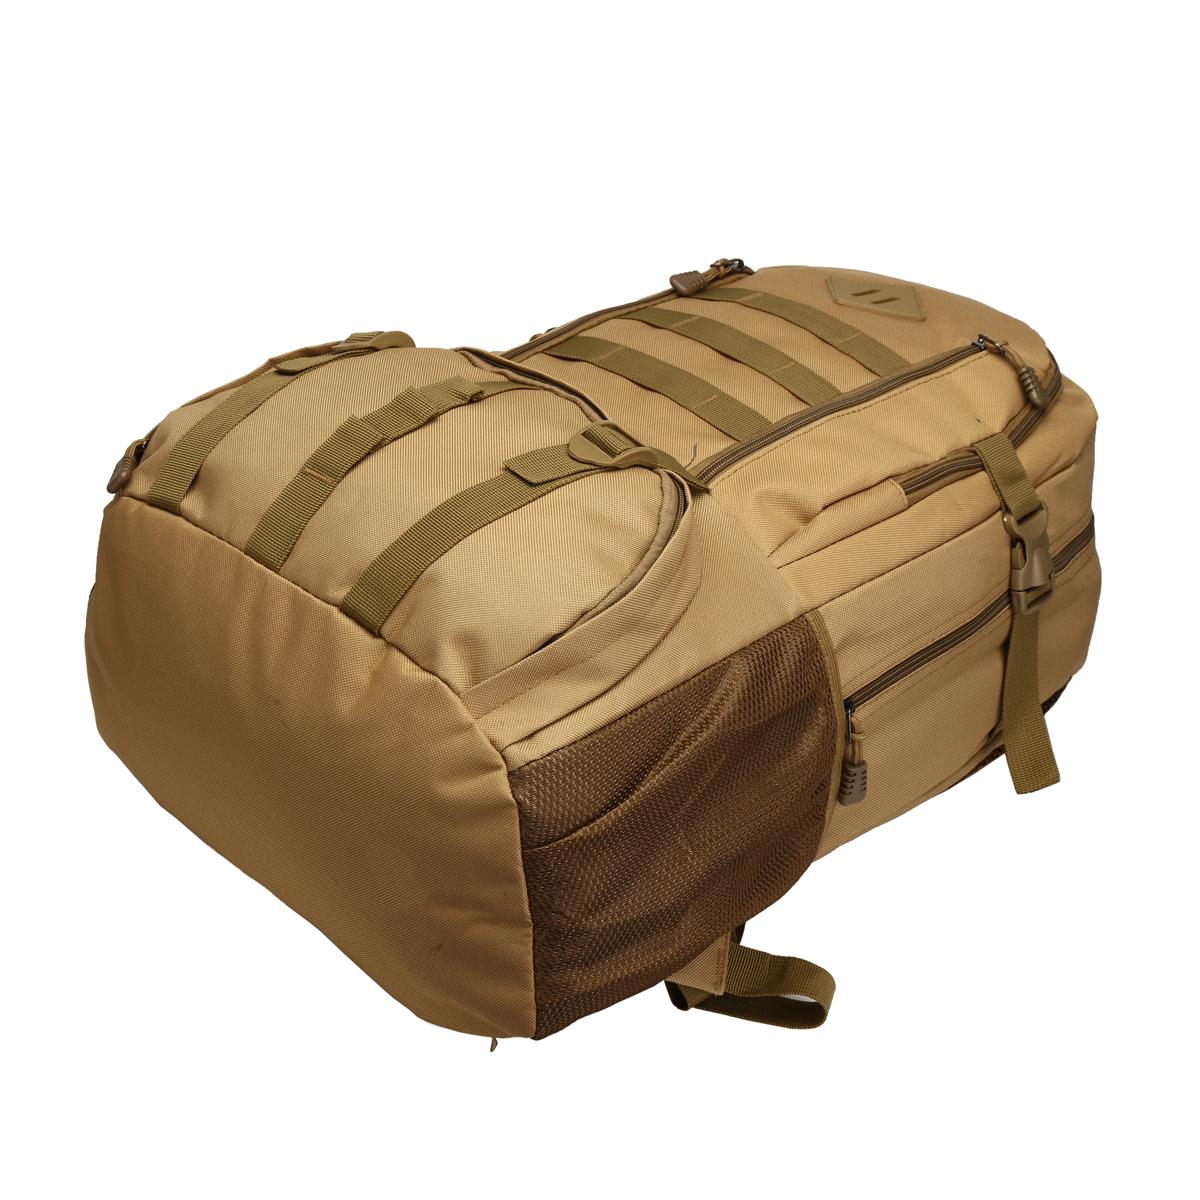 50L Tactical Climbing Bags Waterproof 16.5inch Laptop Bag Camping Travel Hiking Backpack Sport Rucksack